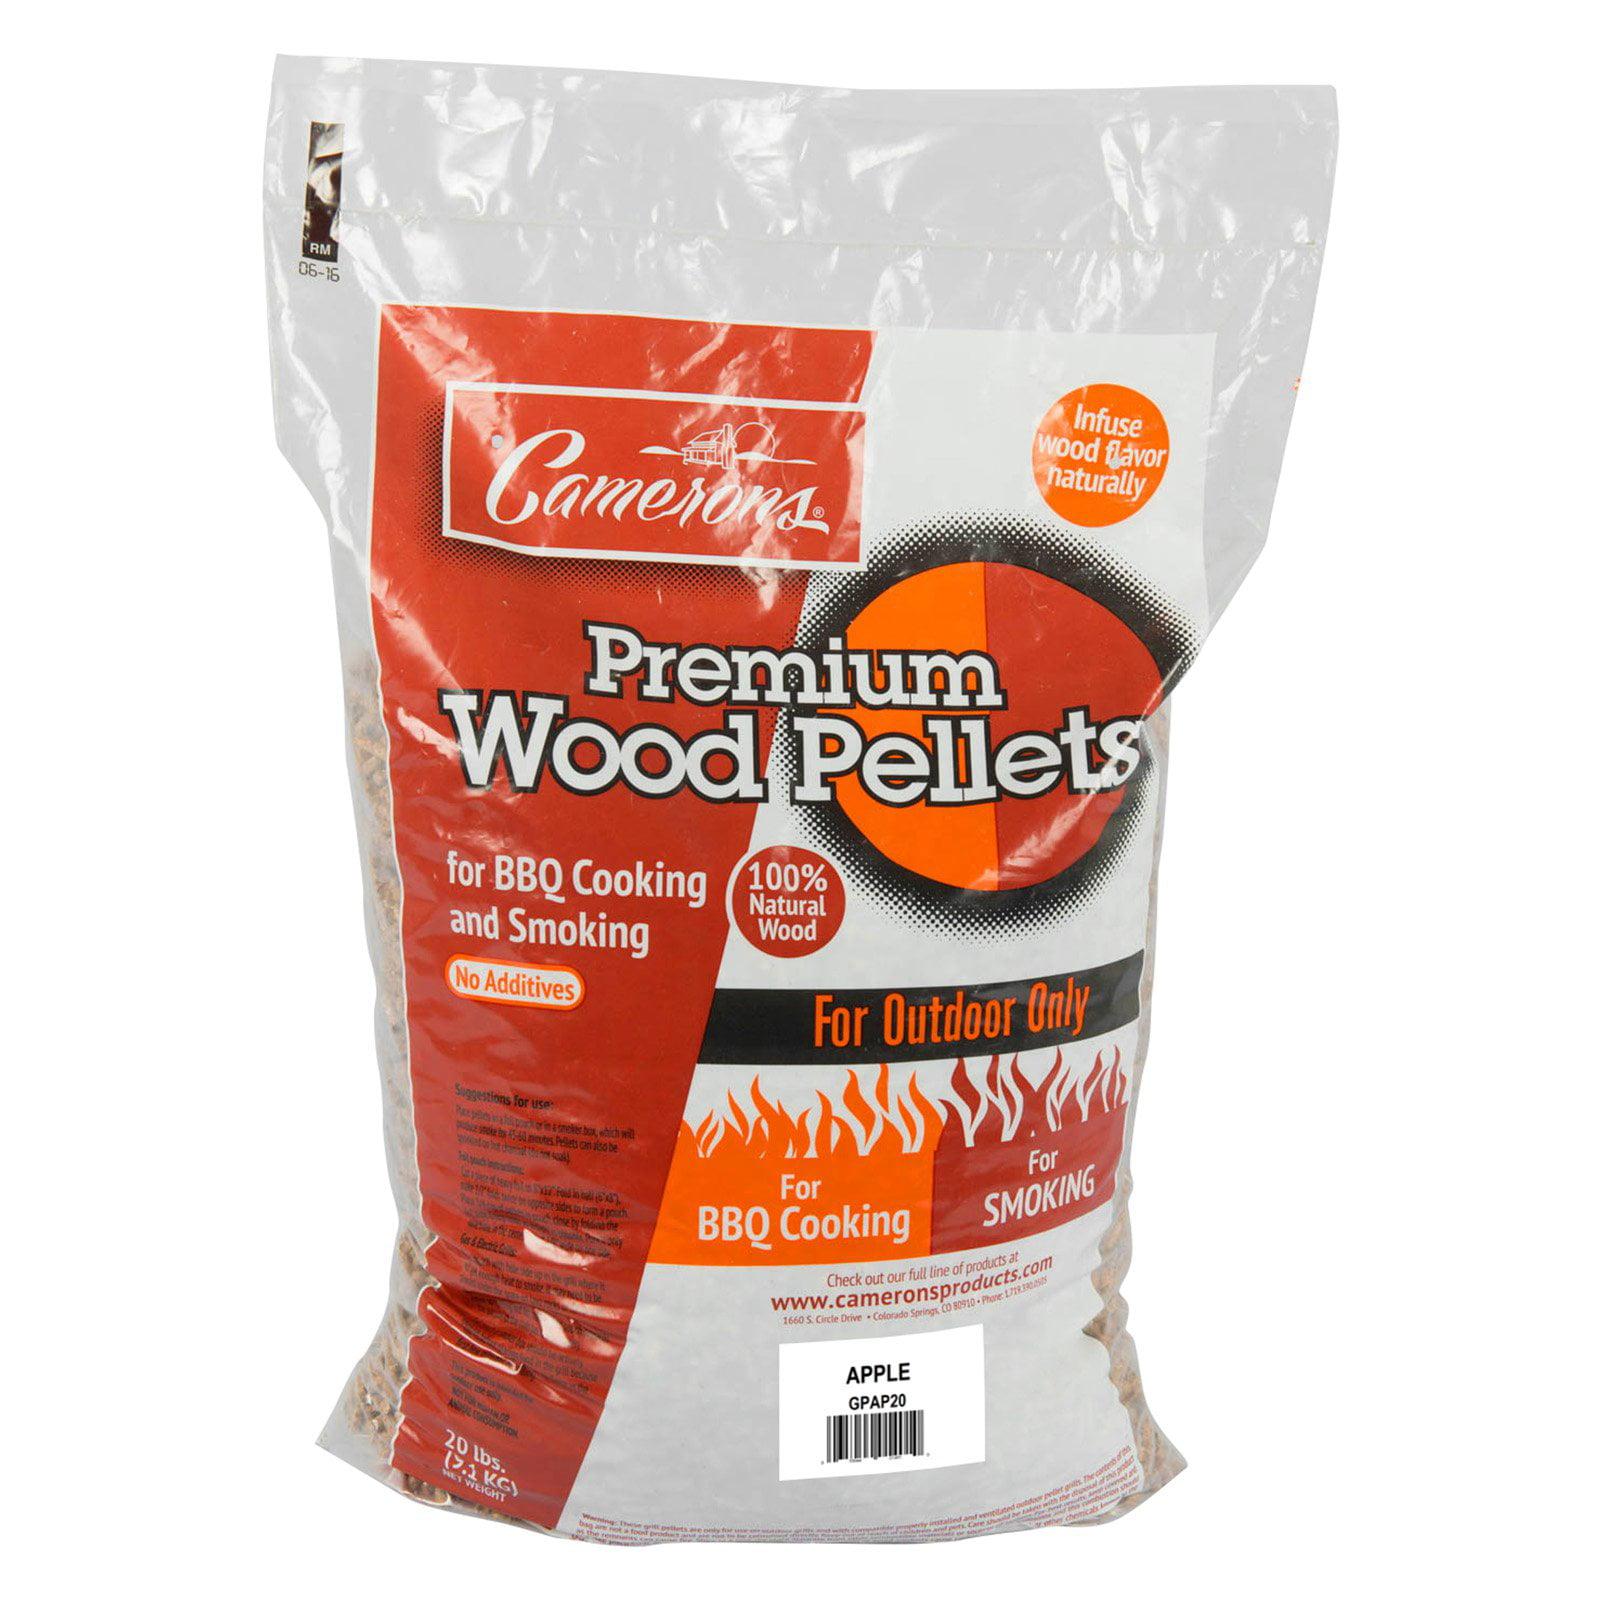 Camerons Premium Wood Pellets - 2 Bags